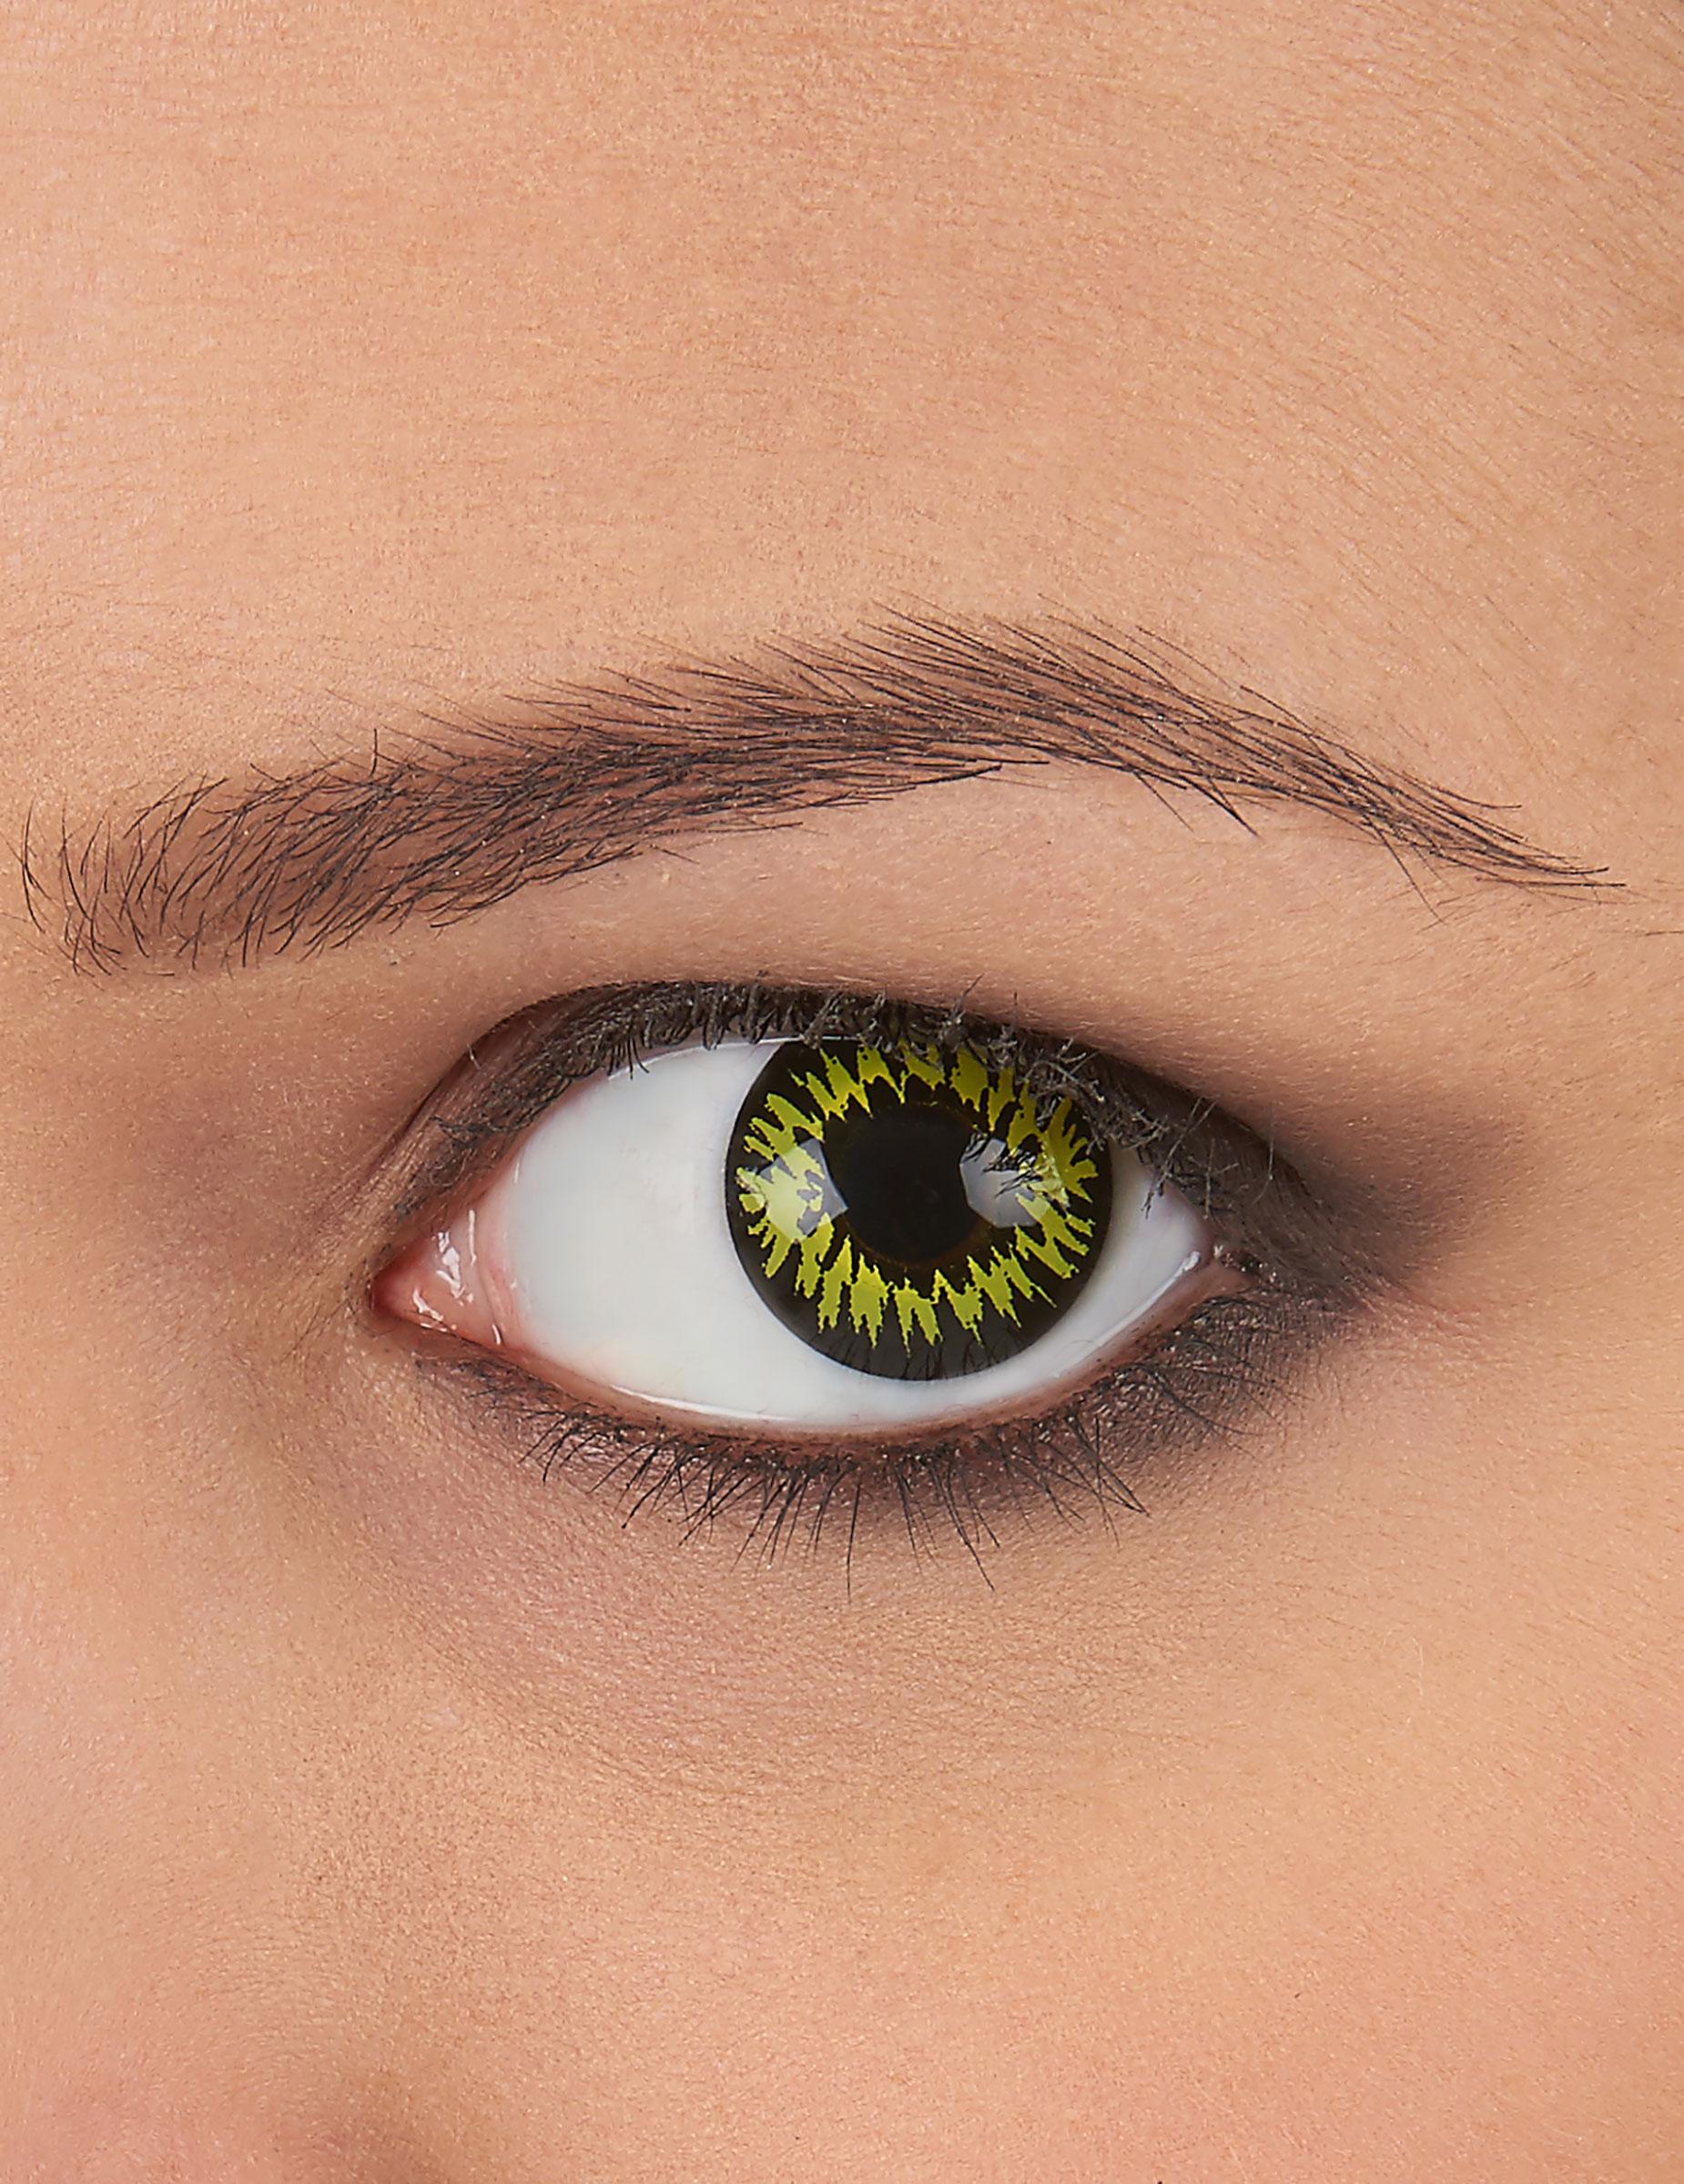 d monische kontaktlinsen halloween accessoire schwarz gelb. Black Bedroom Furniture Sets. Home Design Ideas